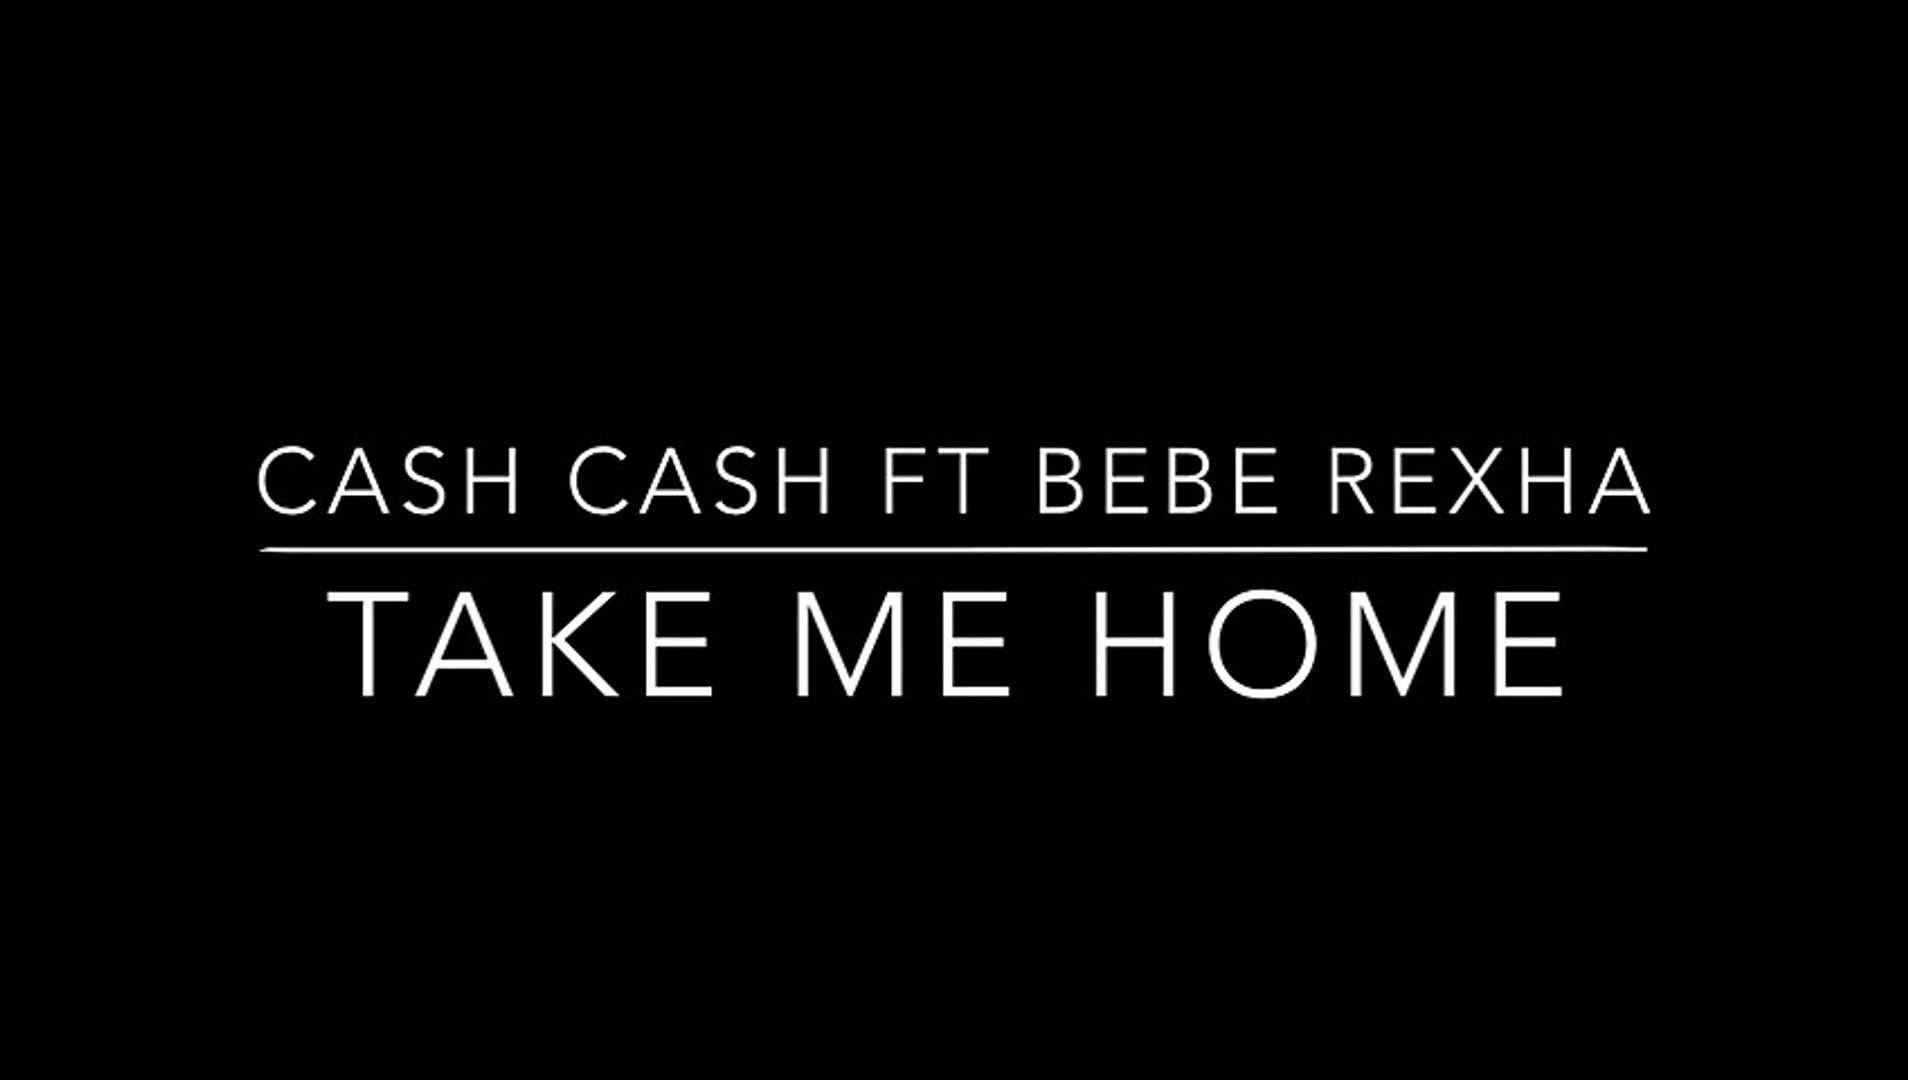 Cash Cash Ft Bebe Rexha Take Me Home Lyrics Video Dailymotion